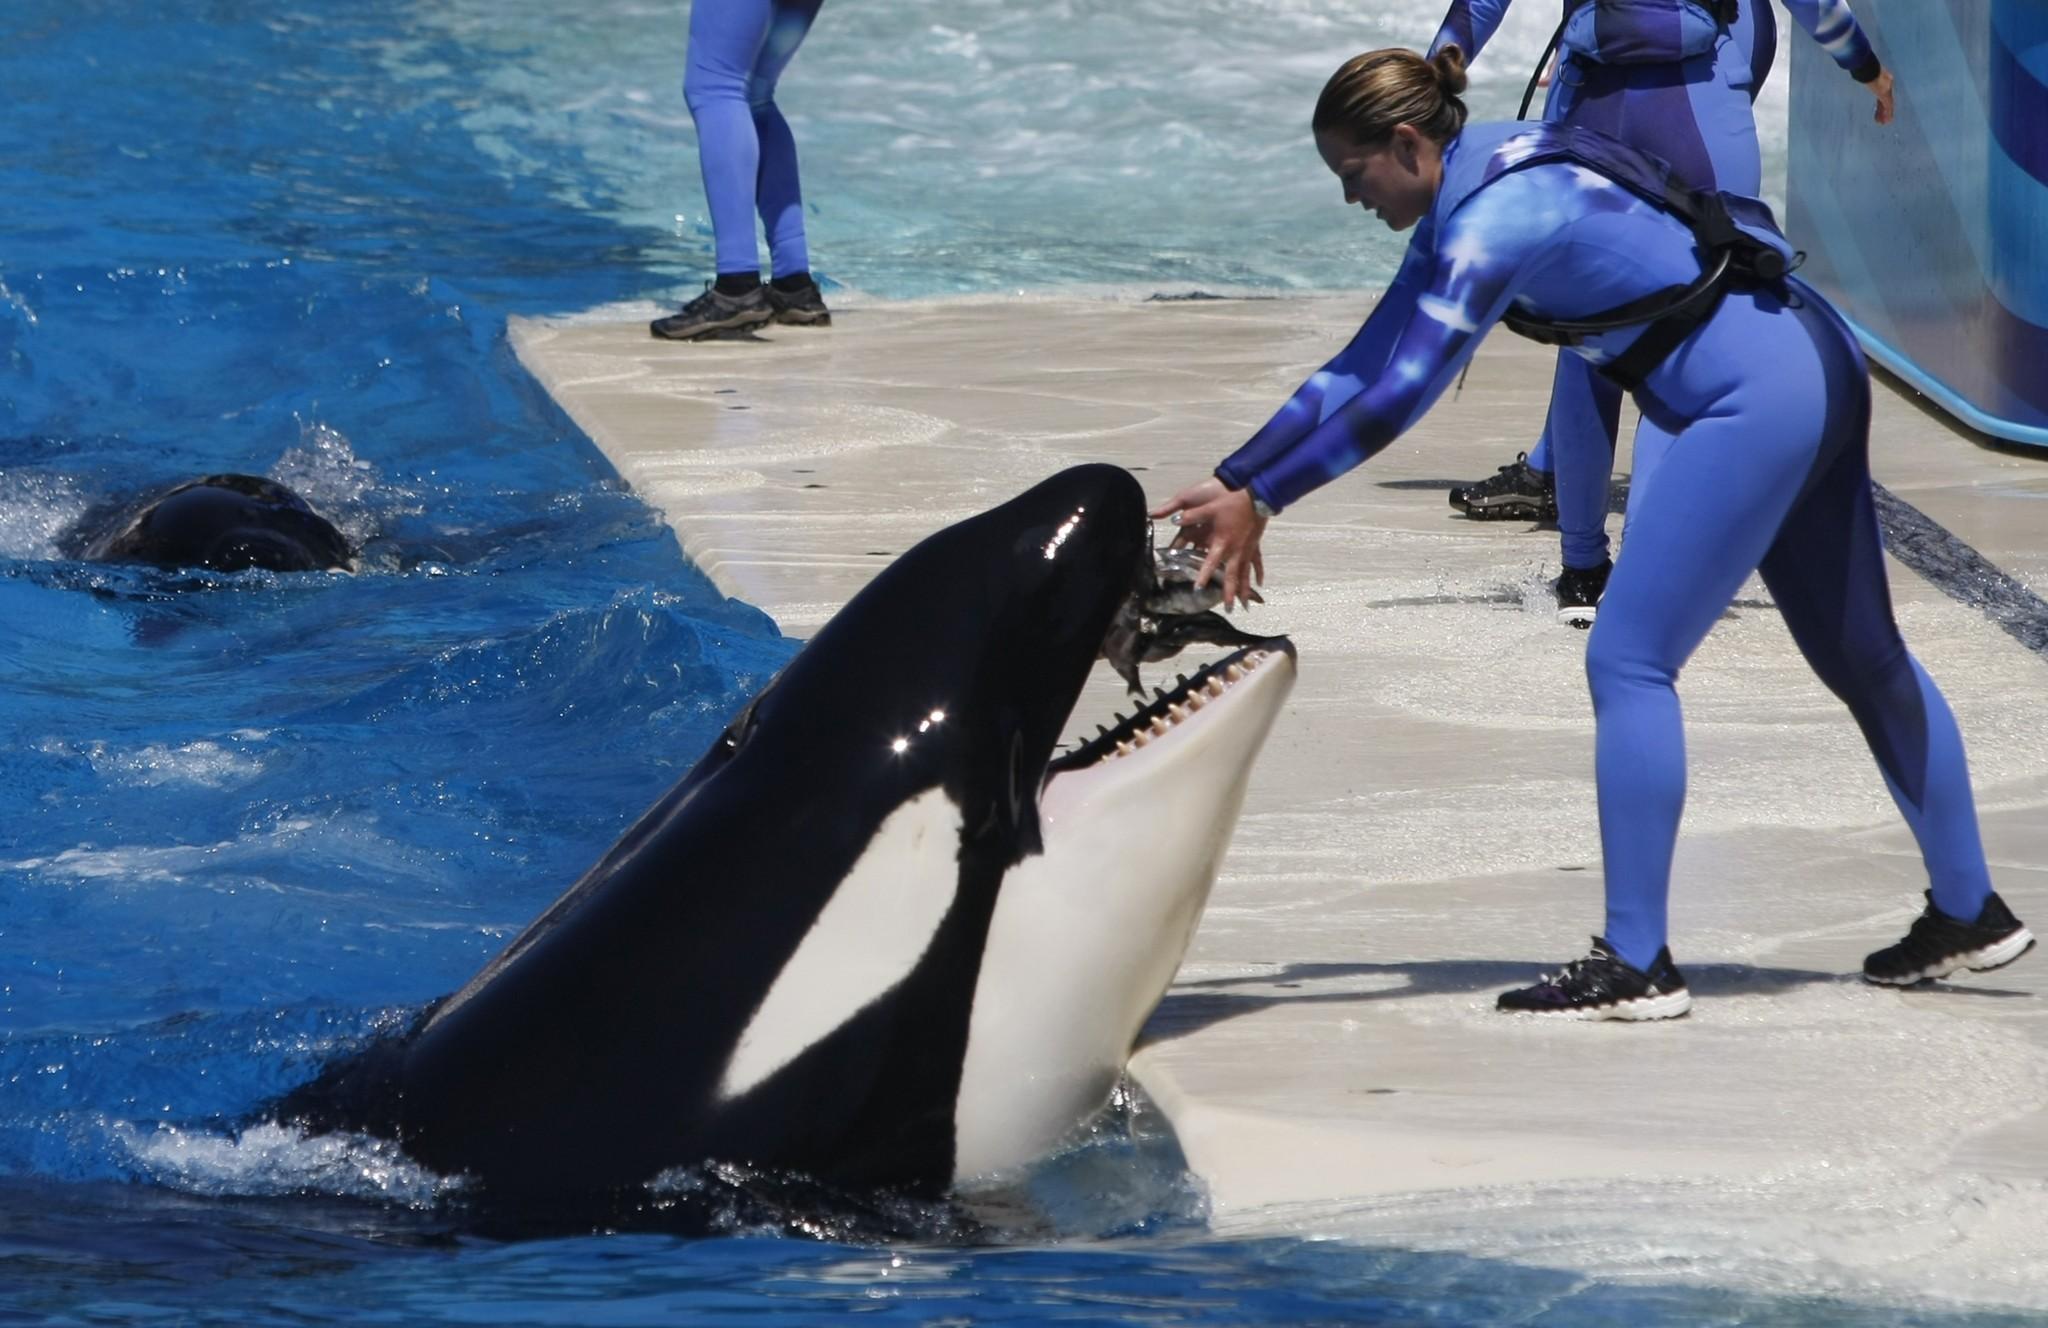 Amid \u0027Blackfish\u0027 backlash, SeaWorld to expand orca environments ...